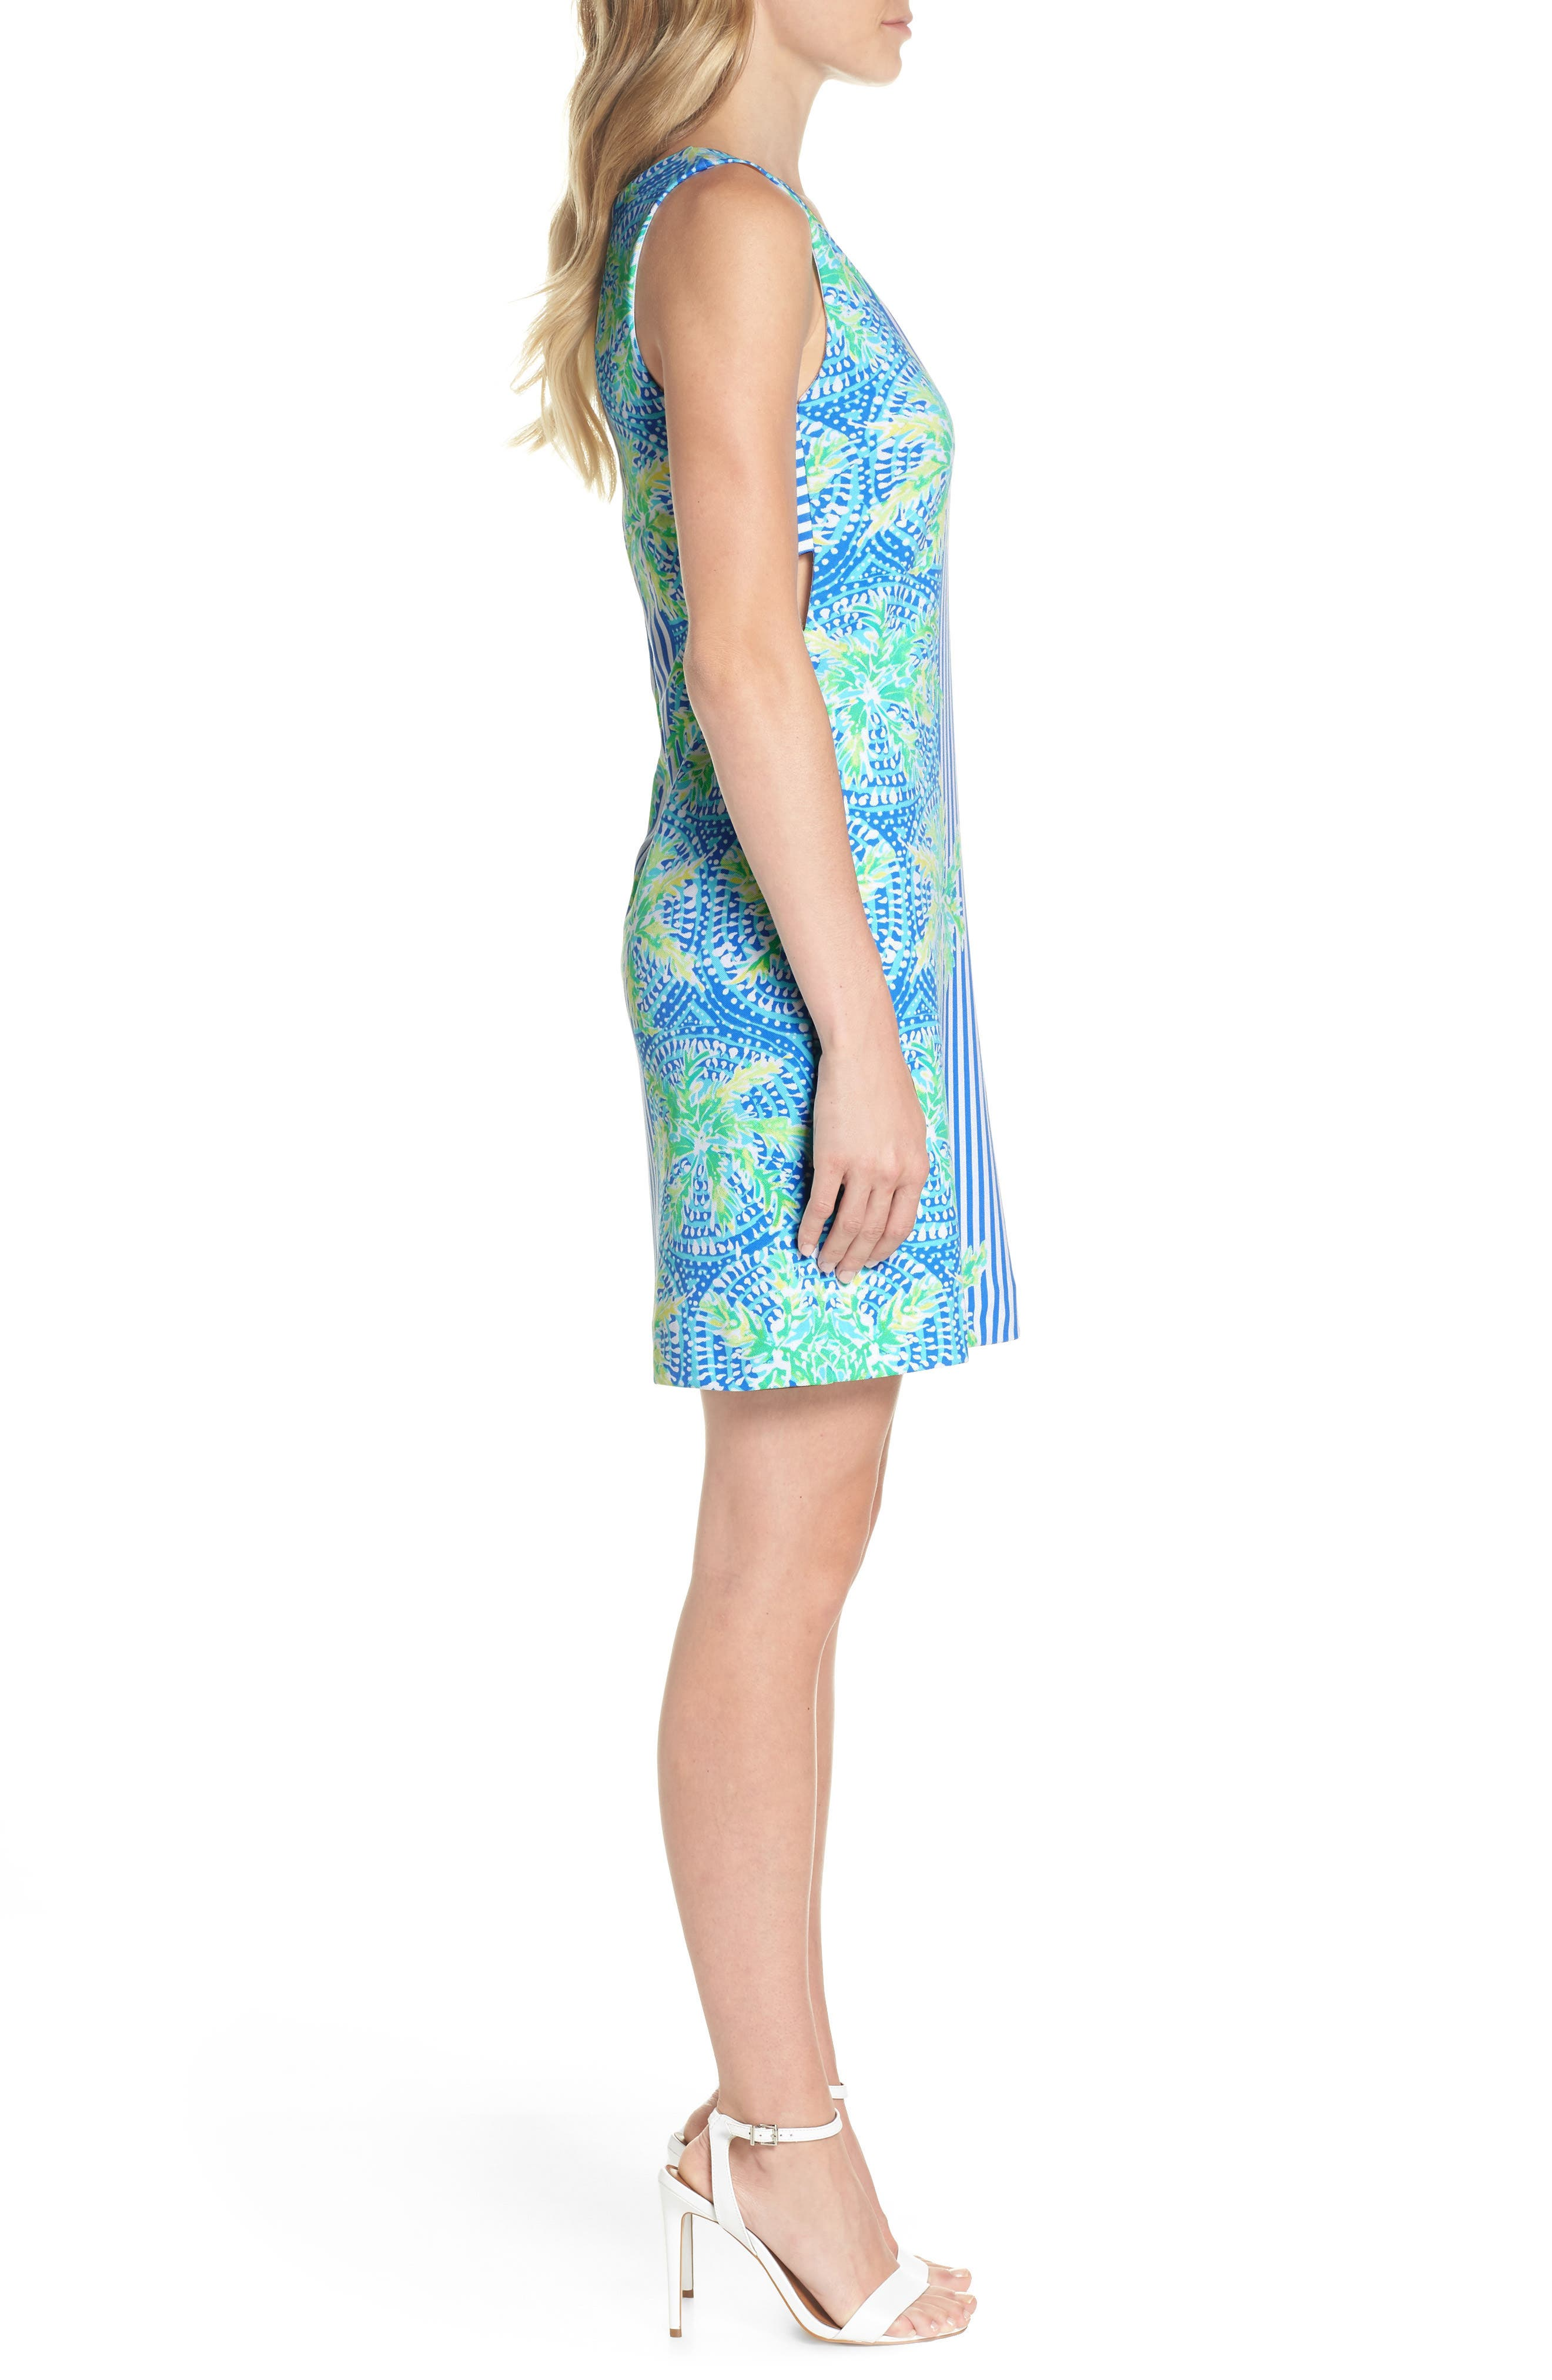 Chiara Stripe & Floral Print Dress,                             Alternate thumbnail 3, color,                             BENNET BLUE TROPIC LIKE ITS